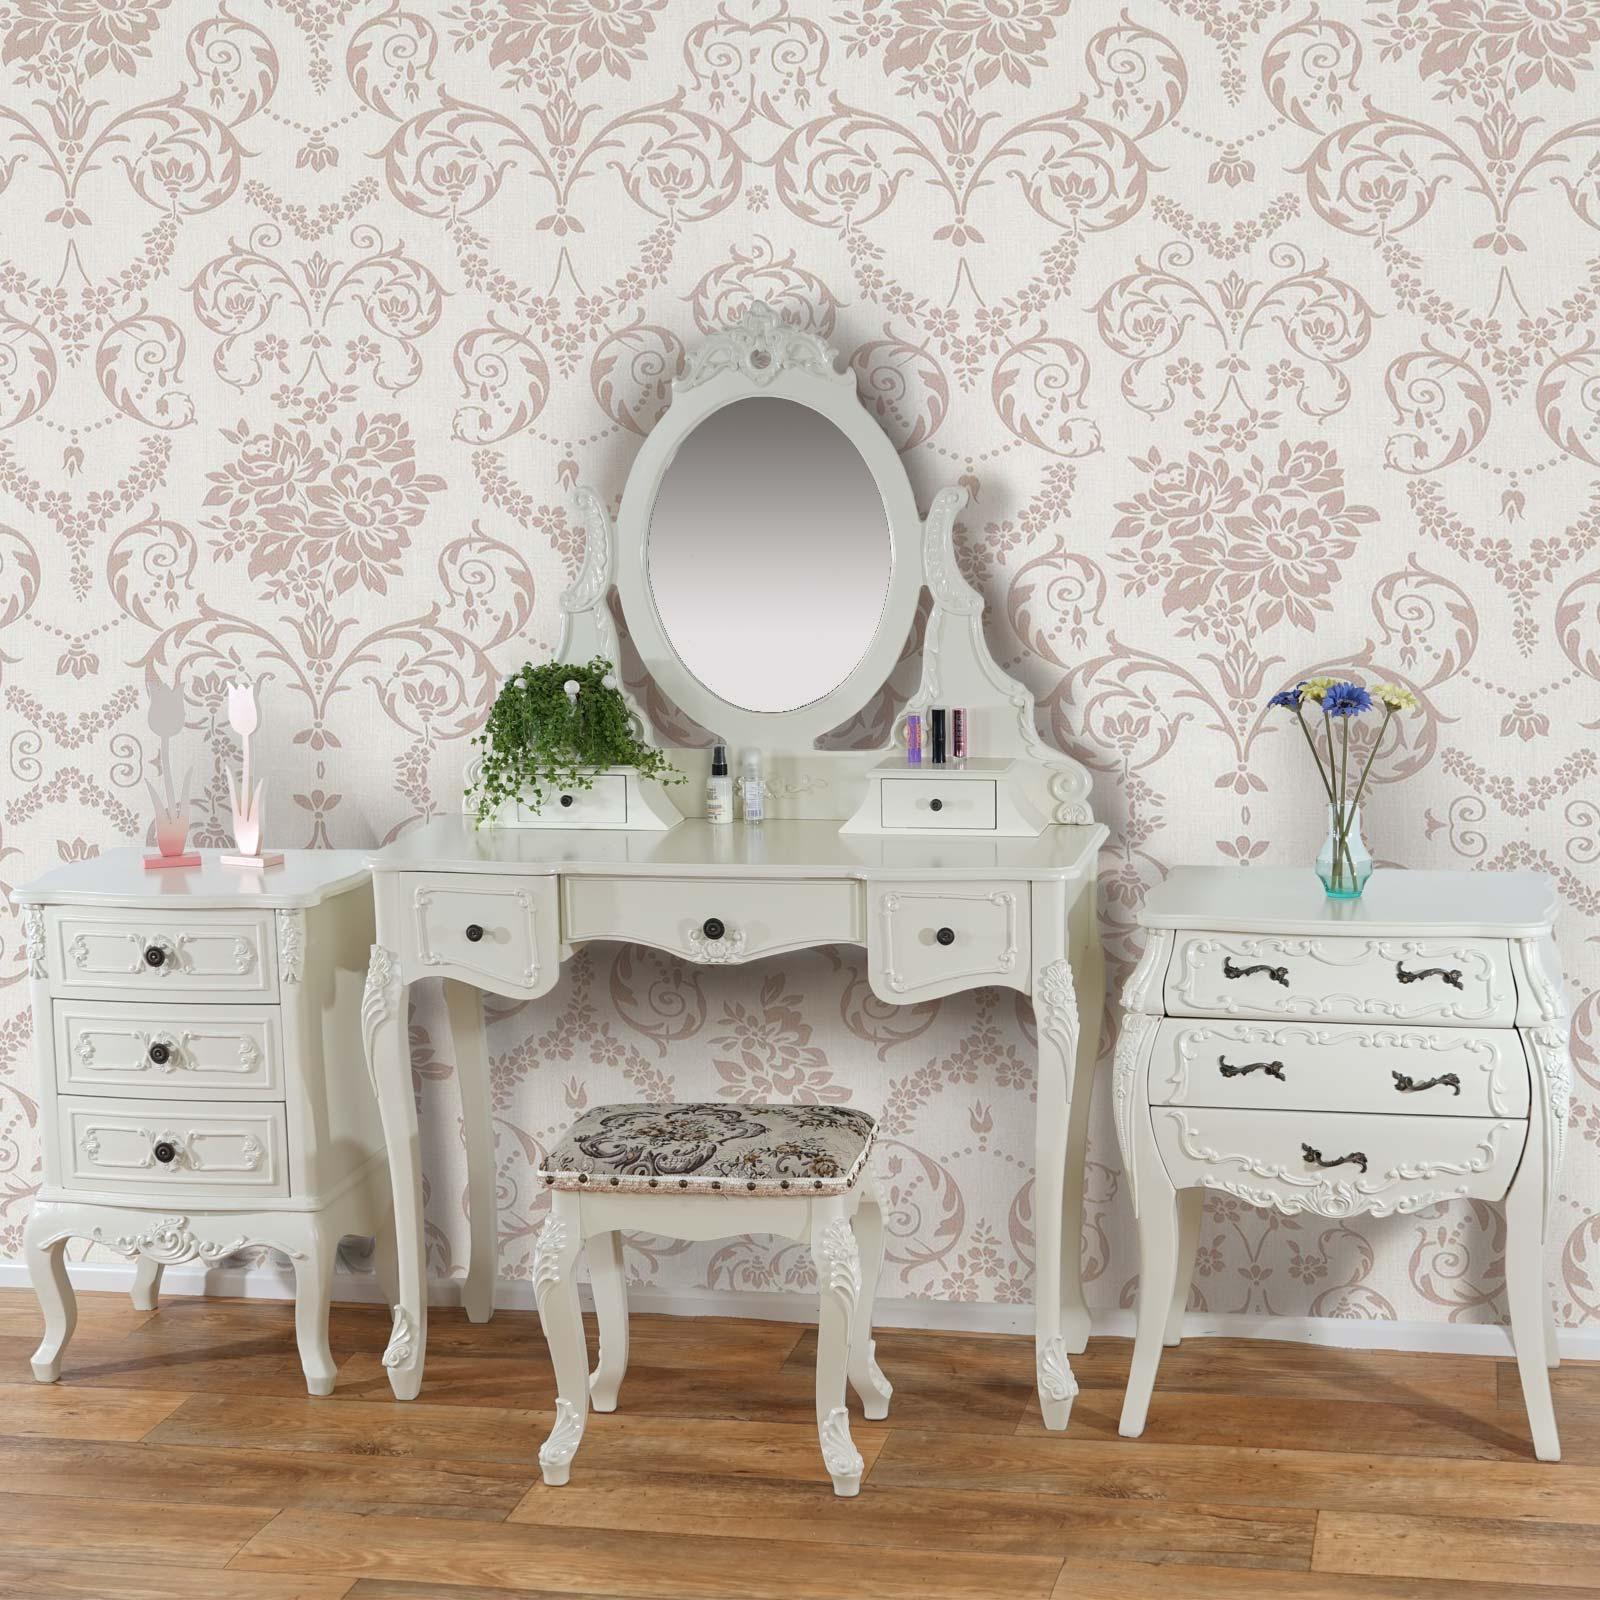 schminktisch set rom kommoden set schrank barock creme wei oder antik wei. Black Bedroom Furniture Sets. Home Design Ideas